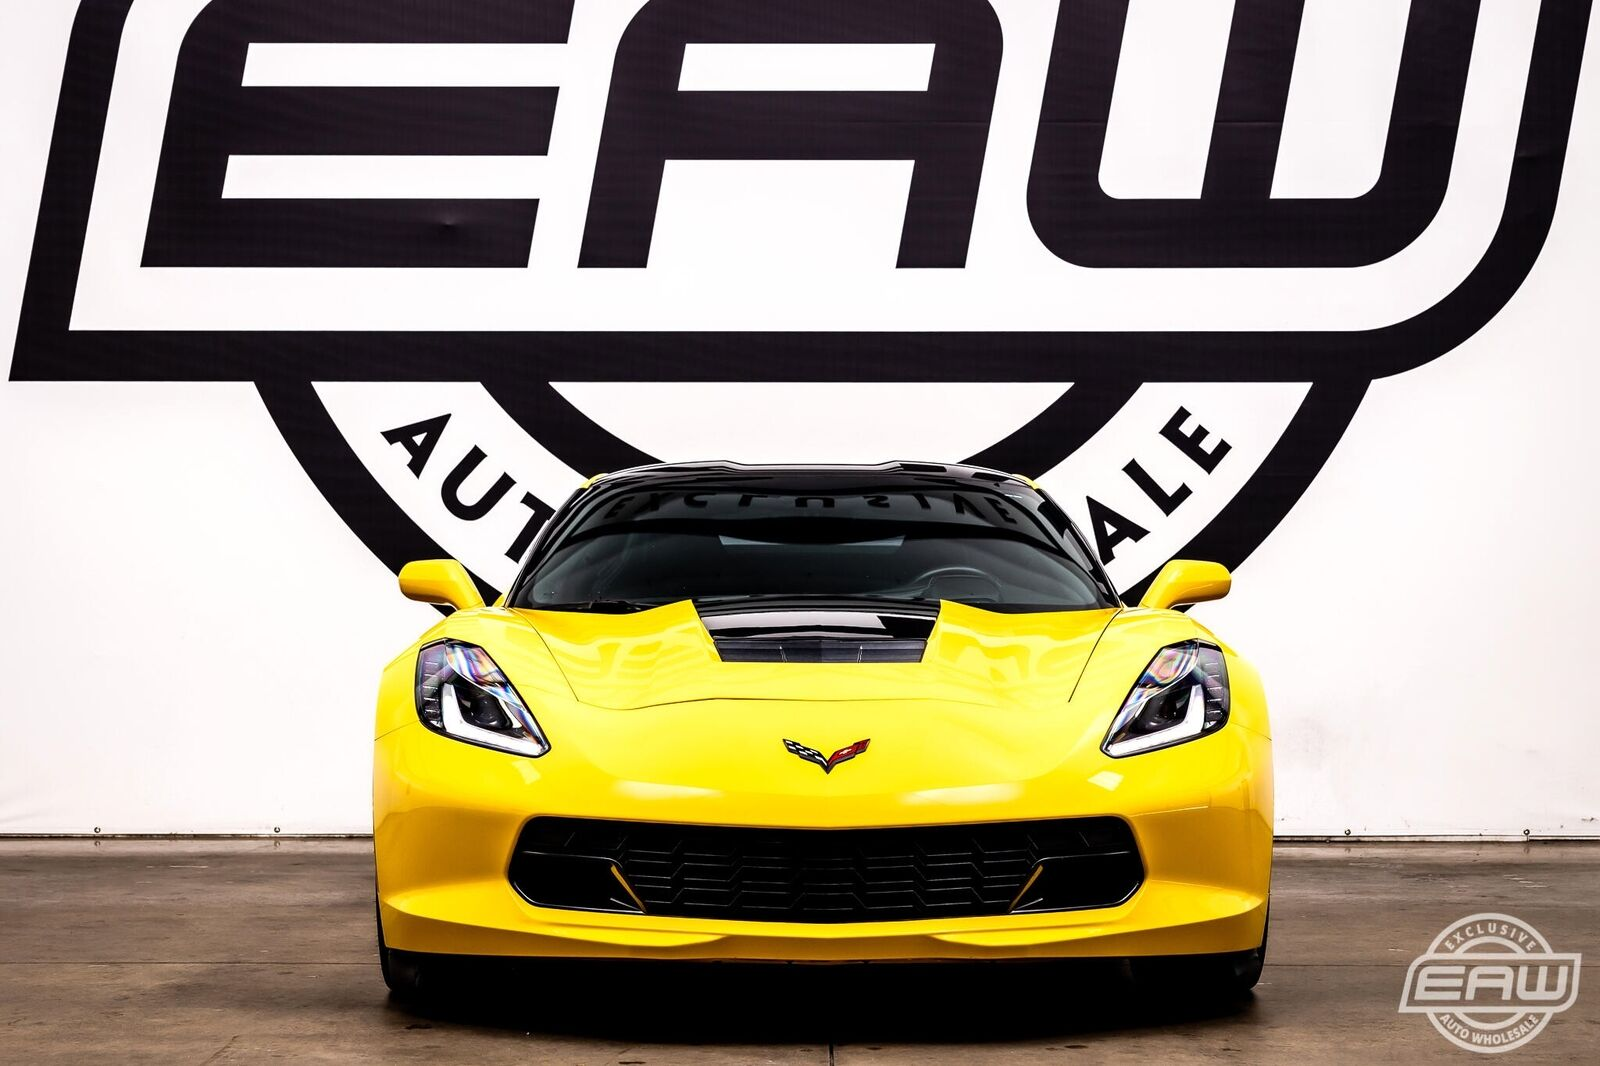 2014 Yellow Chevrolet Corvette Coupe 2LT   C7 Corvette Photo 3